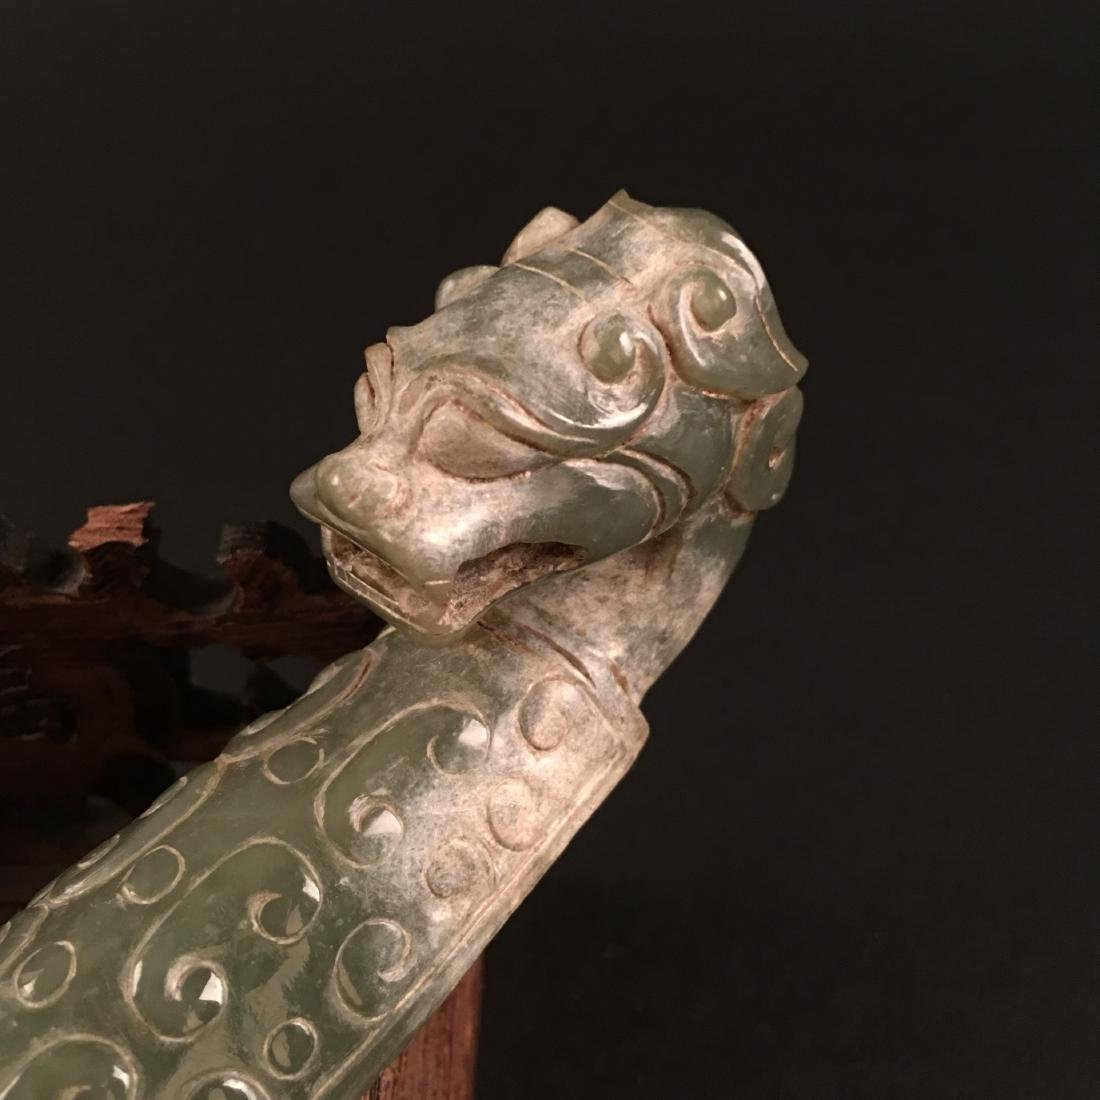 Chinese Archaic Jade Belt Buckle - 3